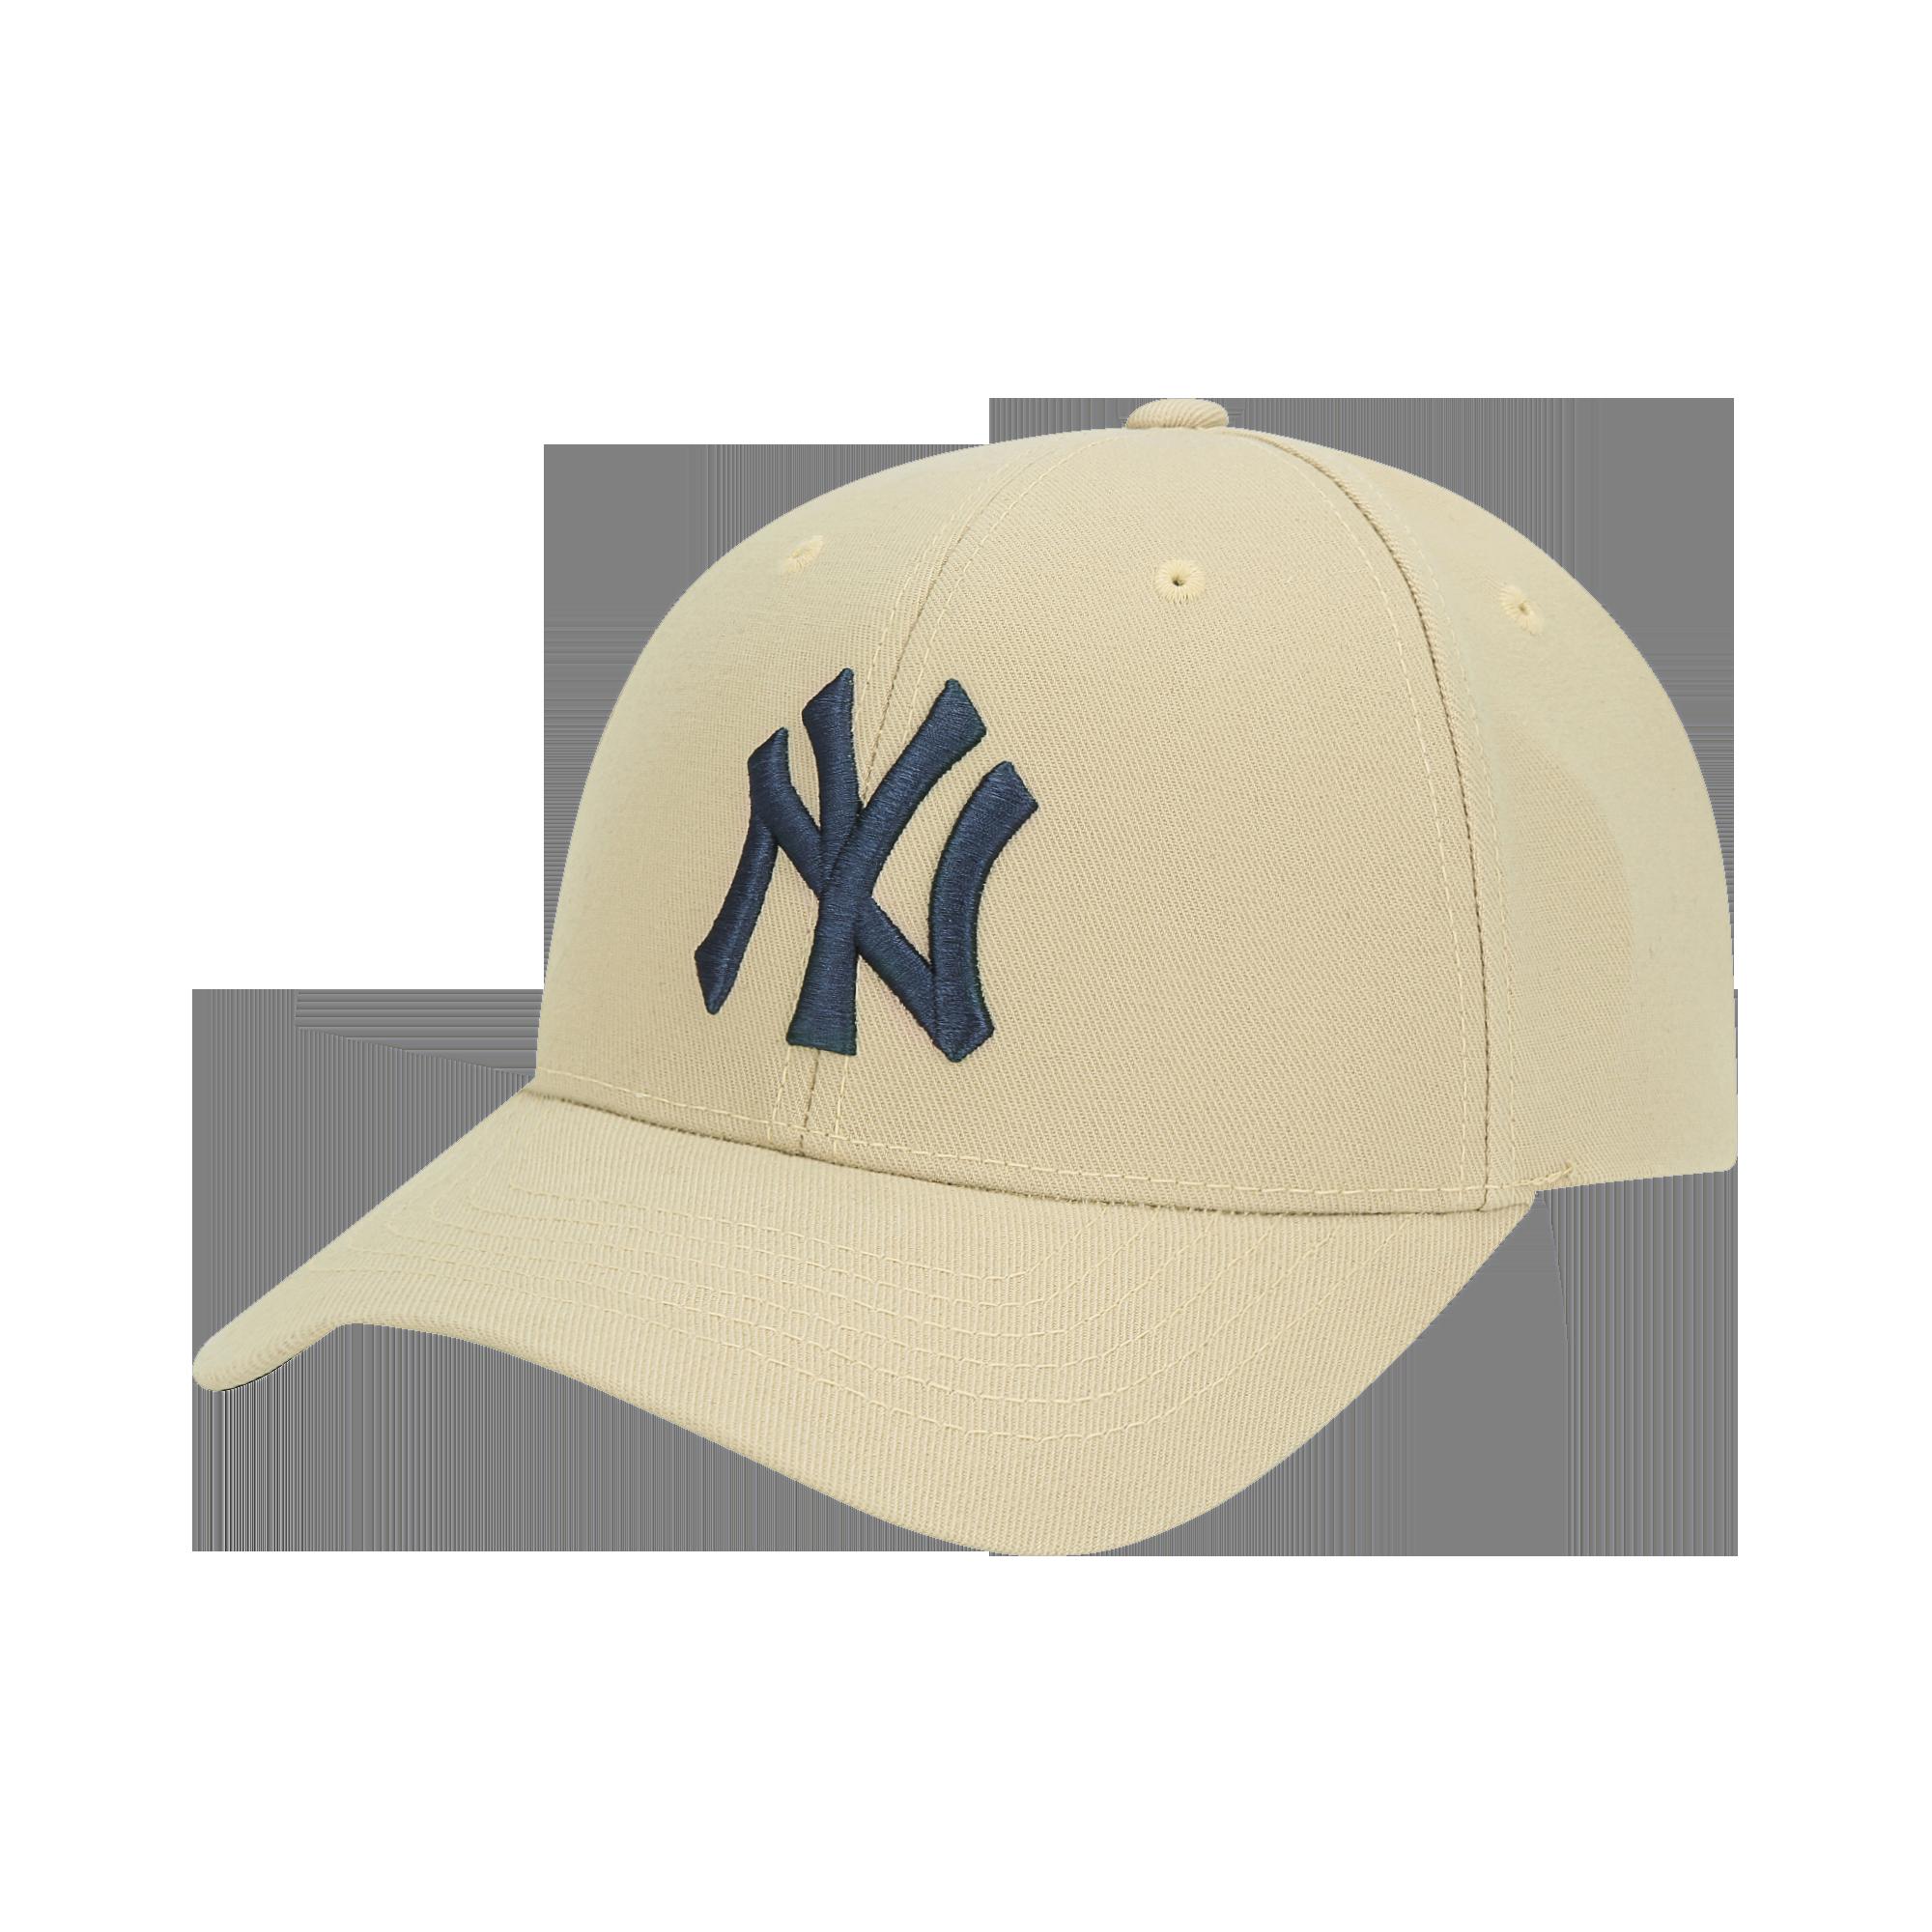 X-FLEX 커브조절캡 뉴욕양키스